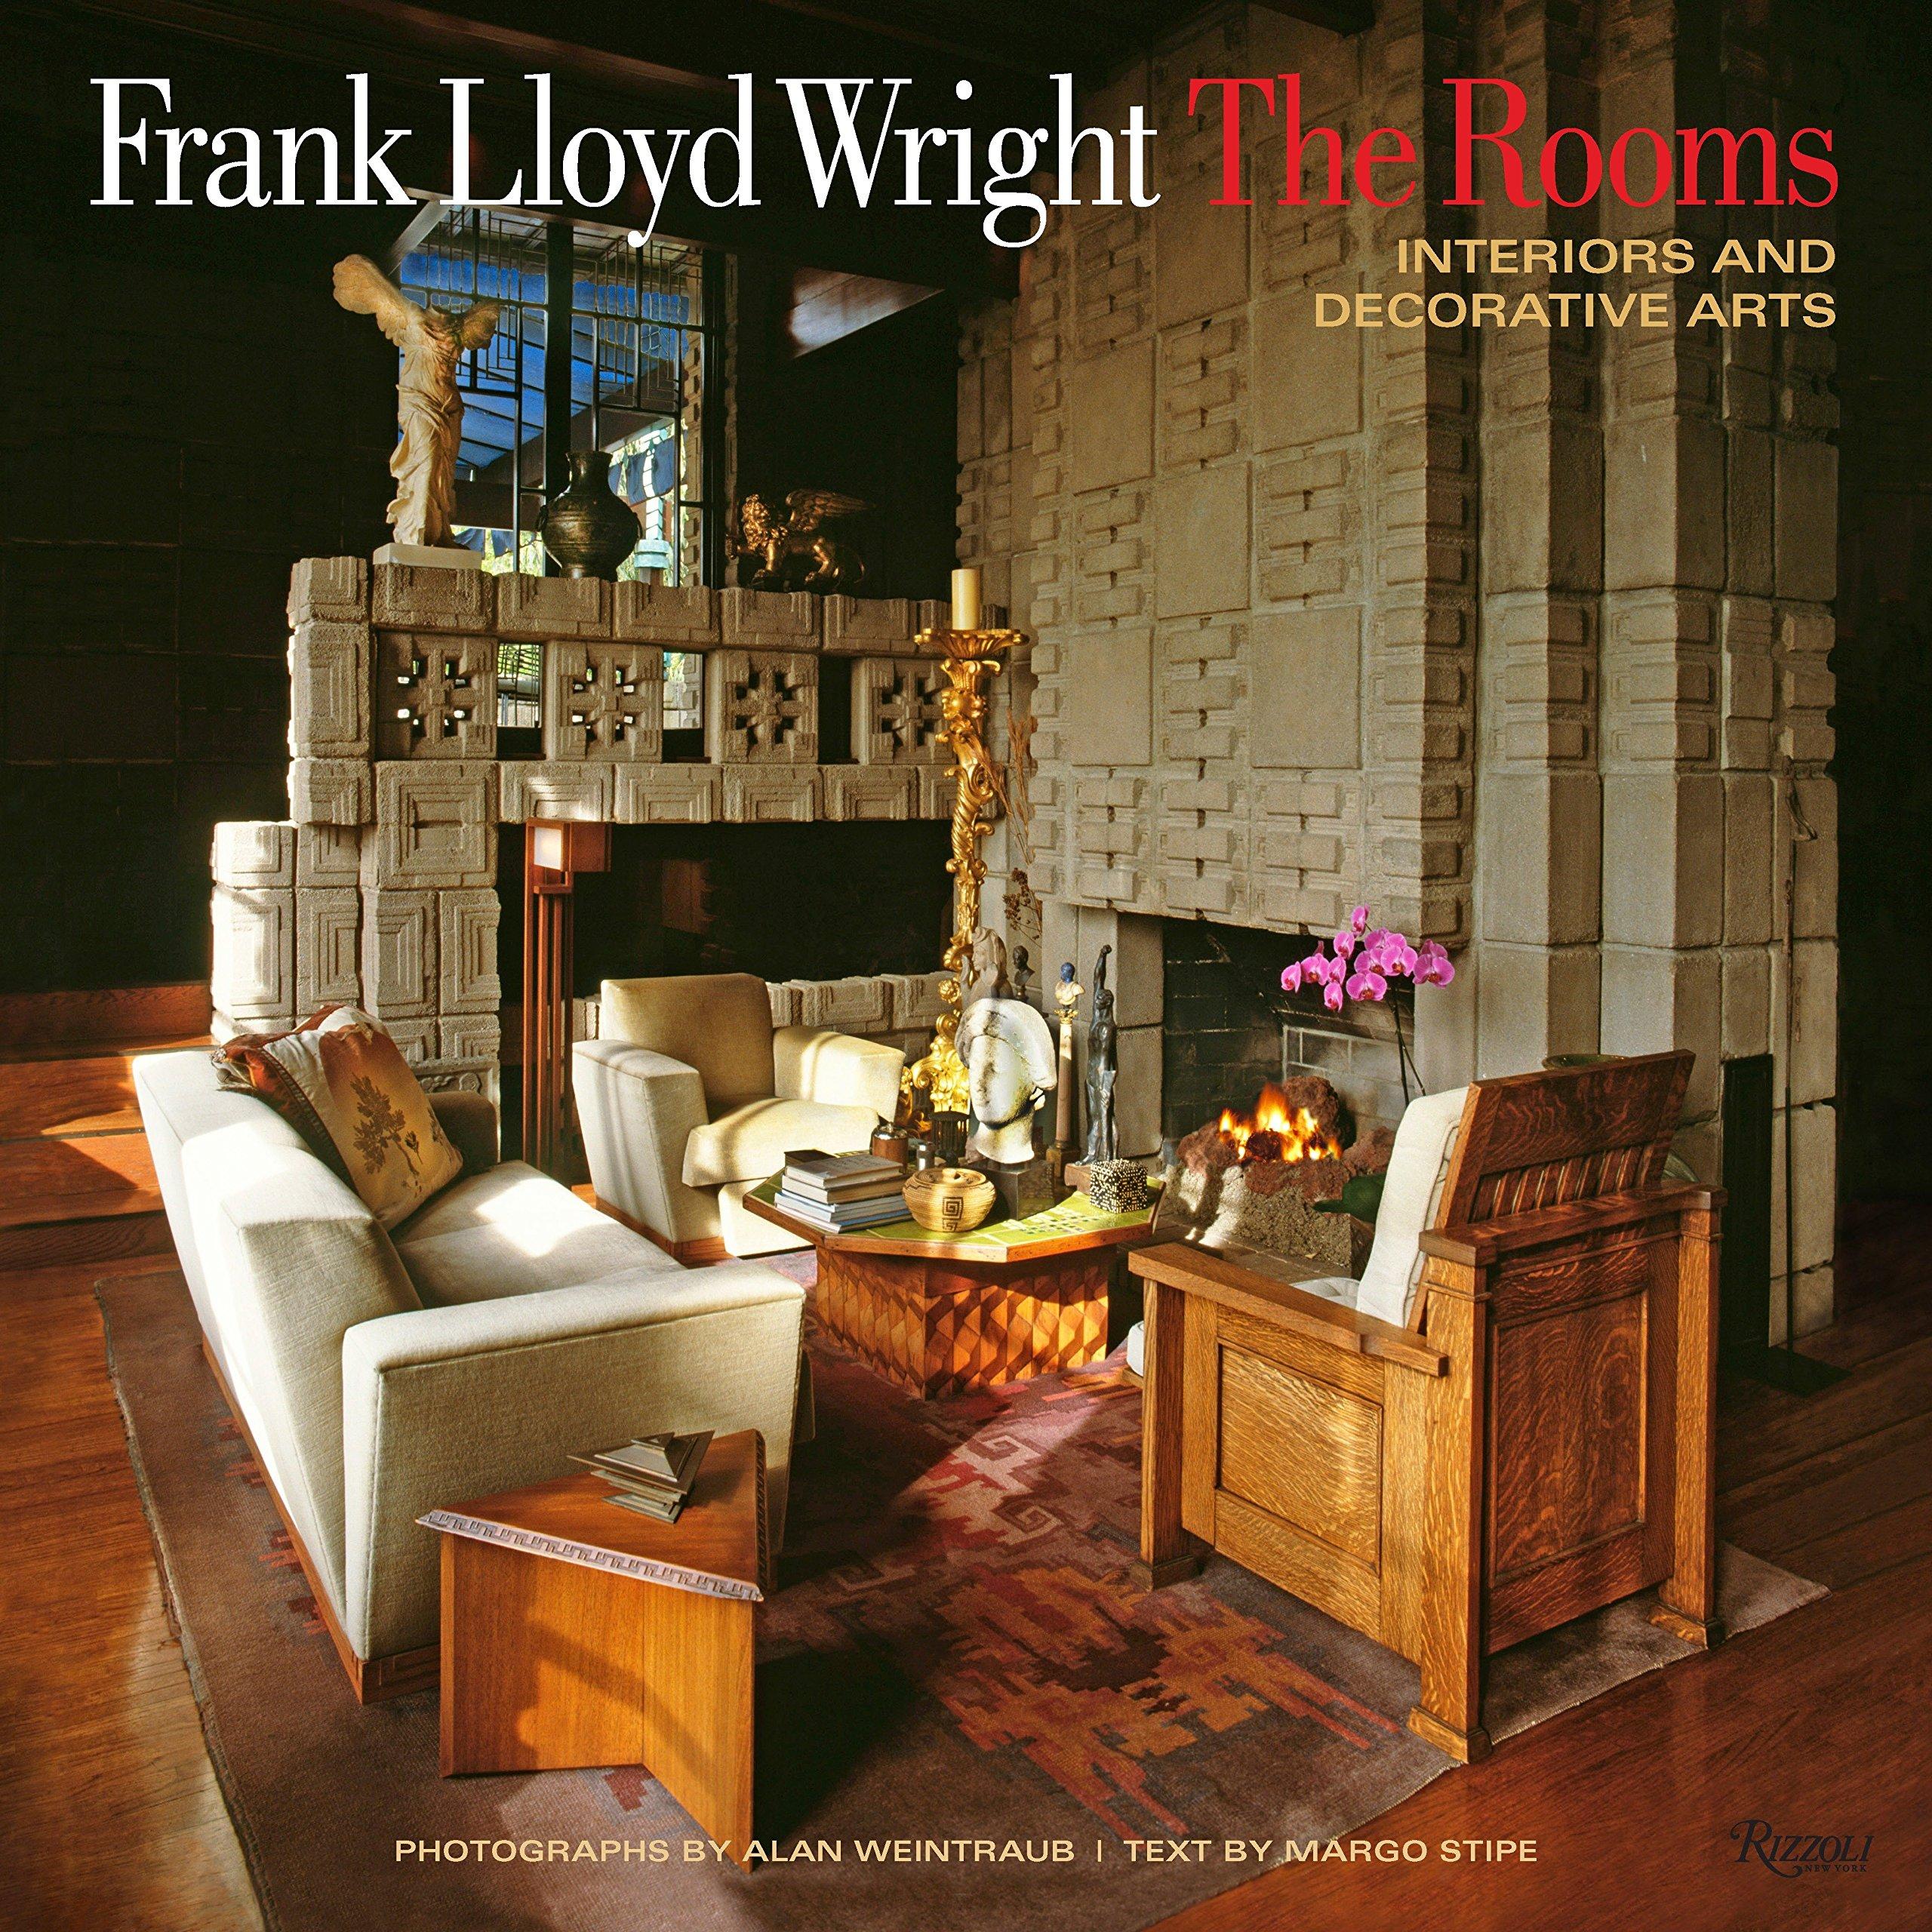 Frank Lloyd Wright: The Rooms: Interiors And Decorative Arts: Margo Stipe,  Alan Weintraub, David A. Hanks: 9780847843428: Amazon.com: Books